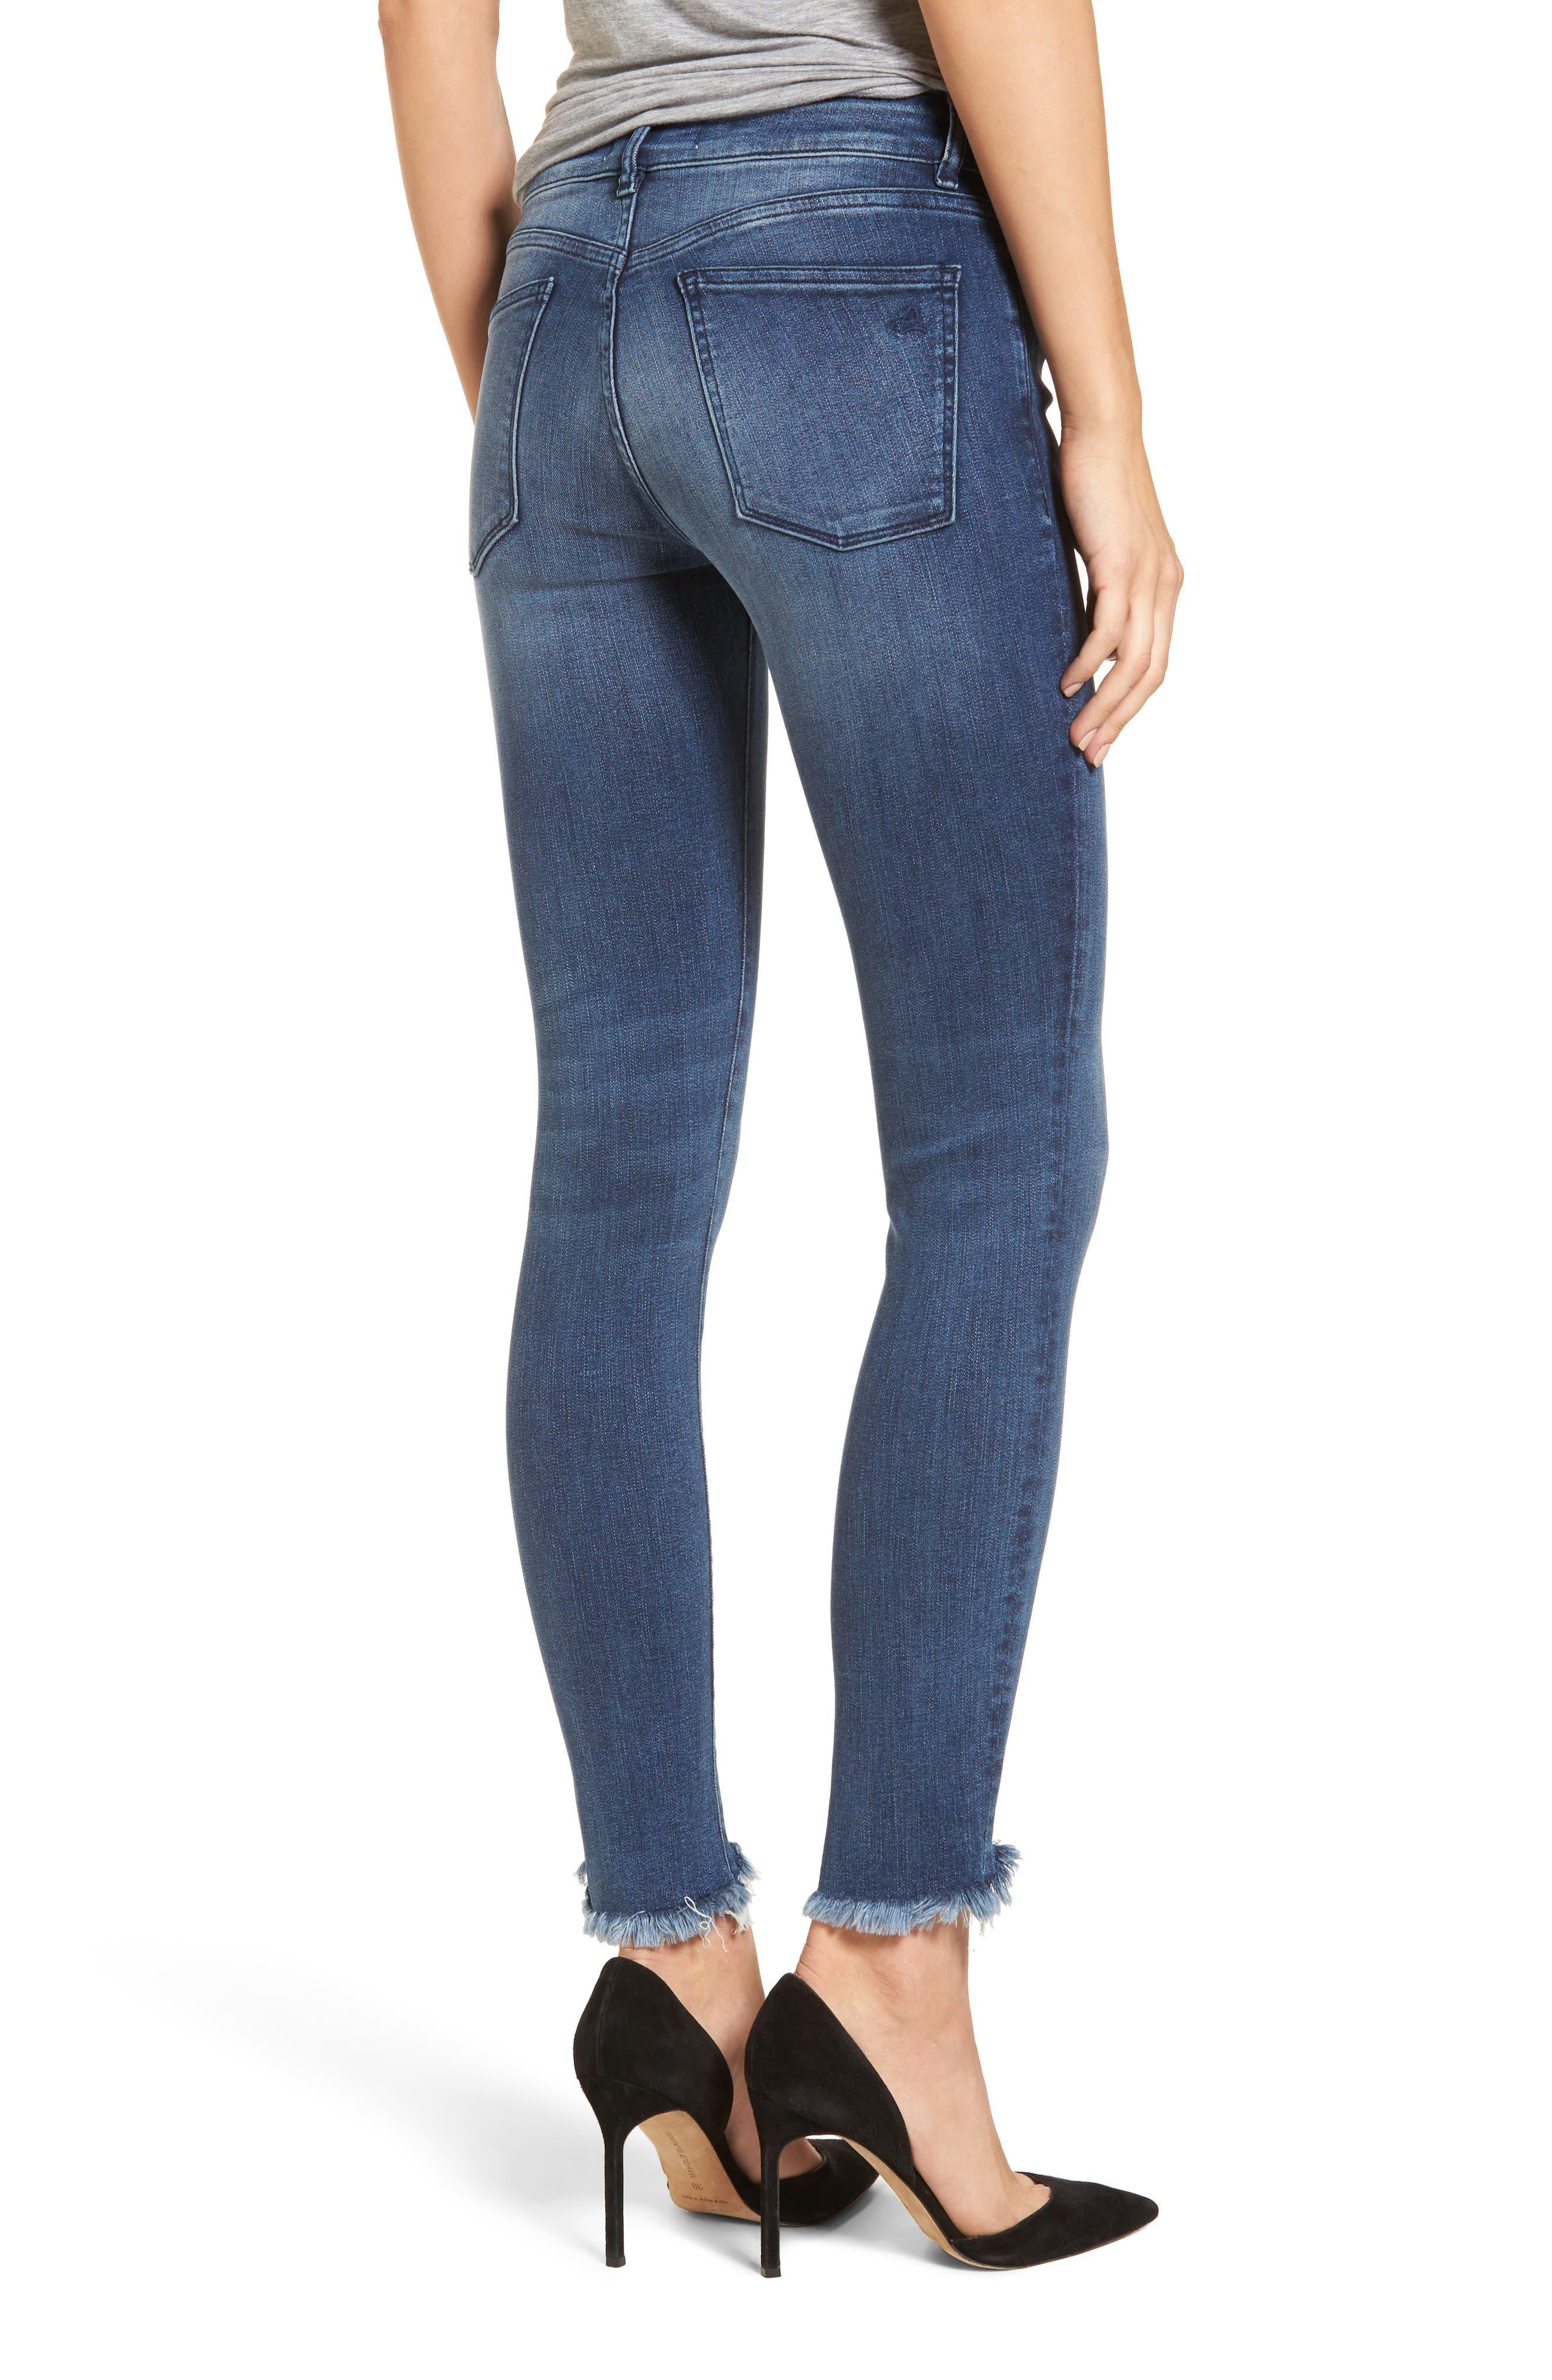 Emma Power Legging Jeans,                             Alternate thumbnail 2, color,                             Fenwick